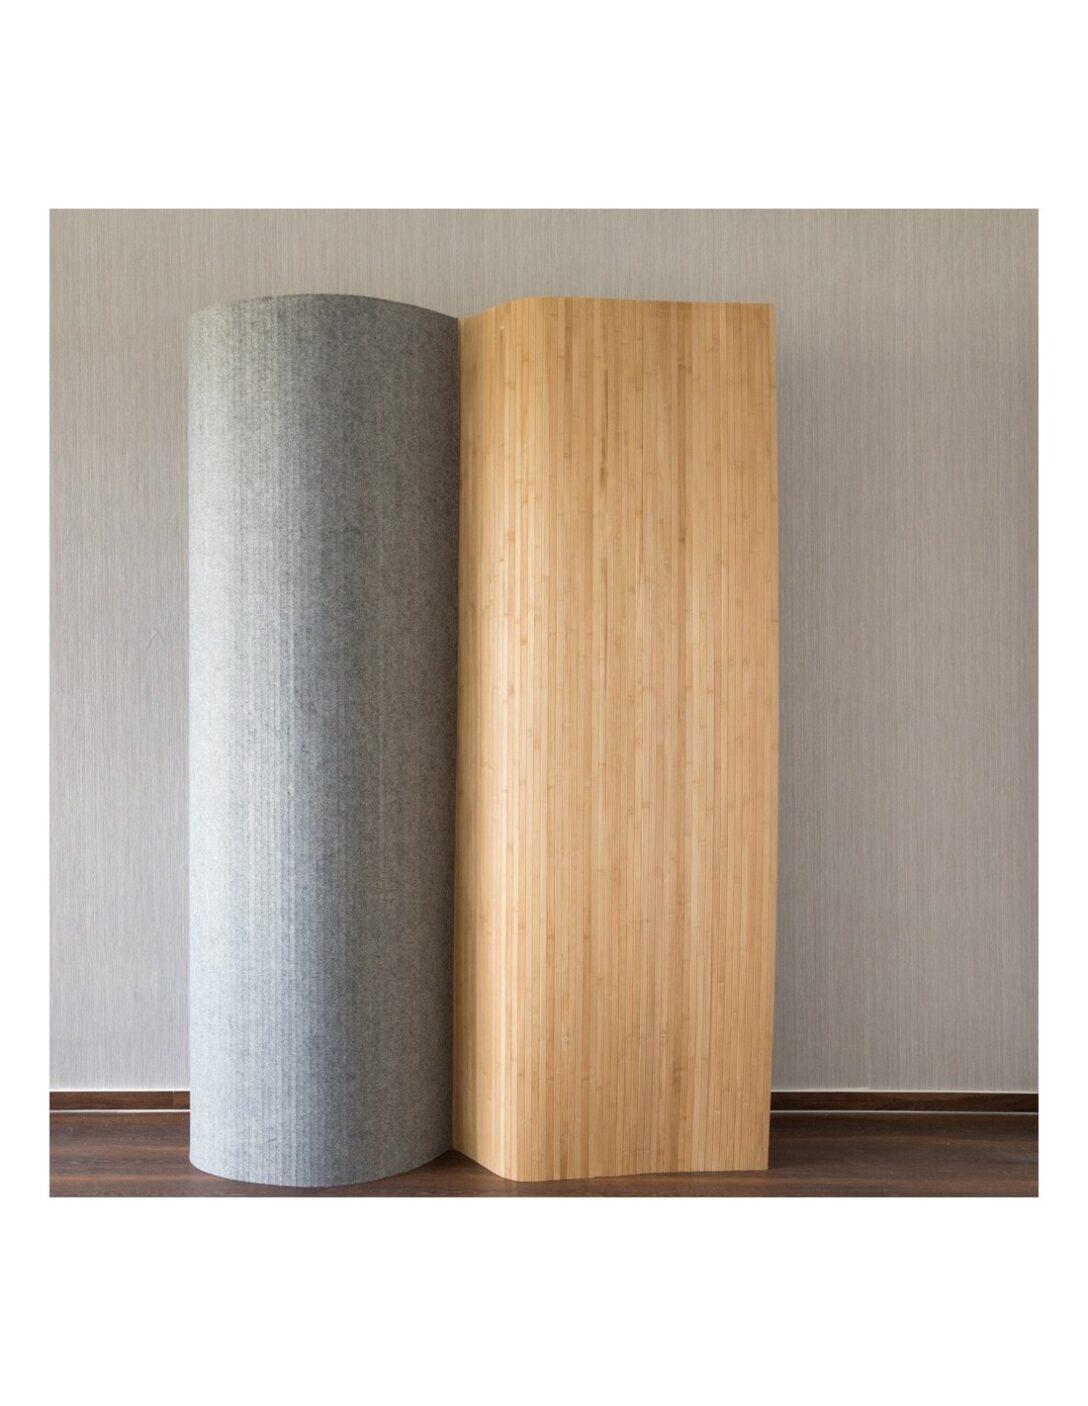 Large Size of Bambus Paravent Raumteiler Trennwand Garten Bett Wohnzimmer Paravent Bambus